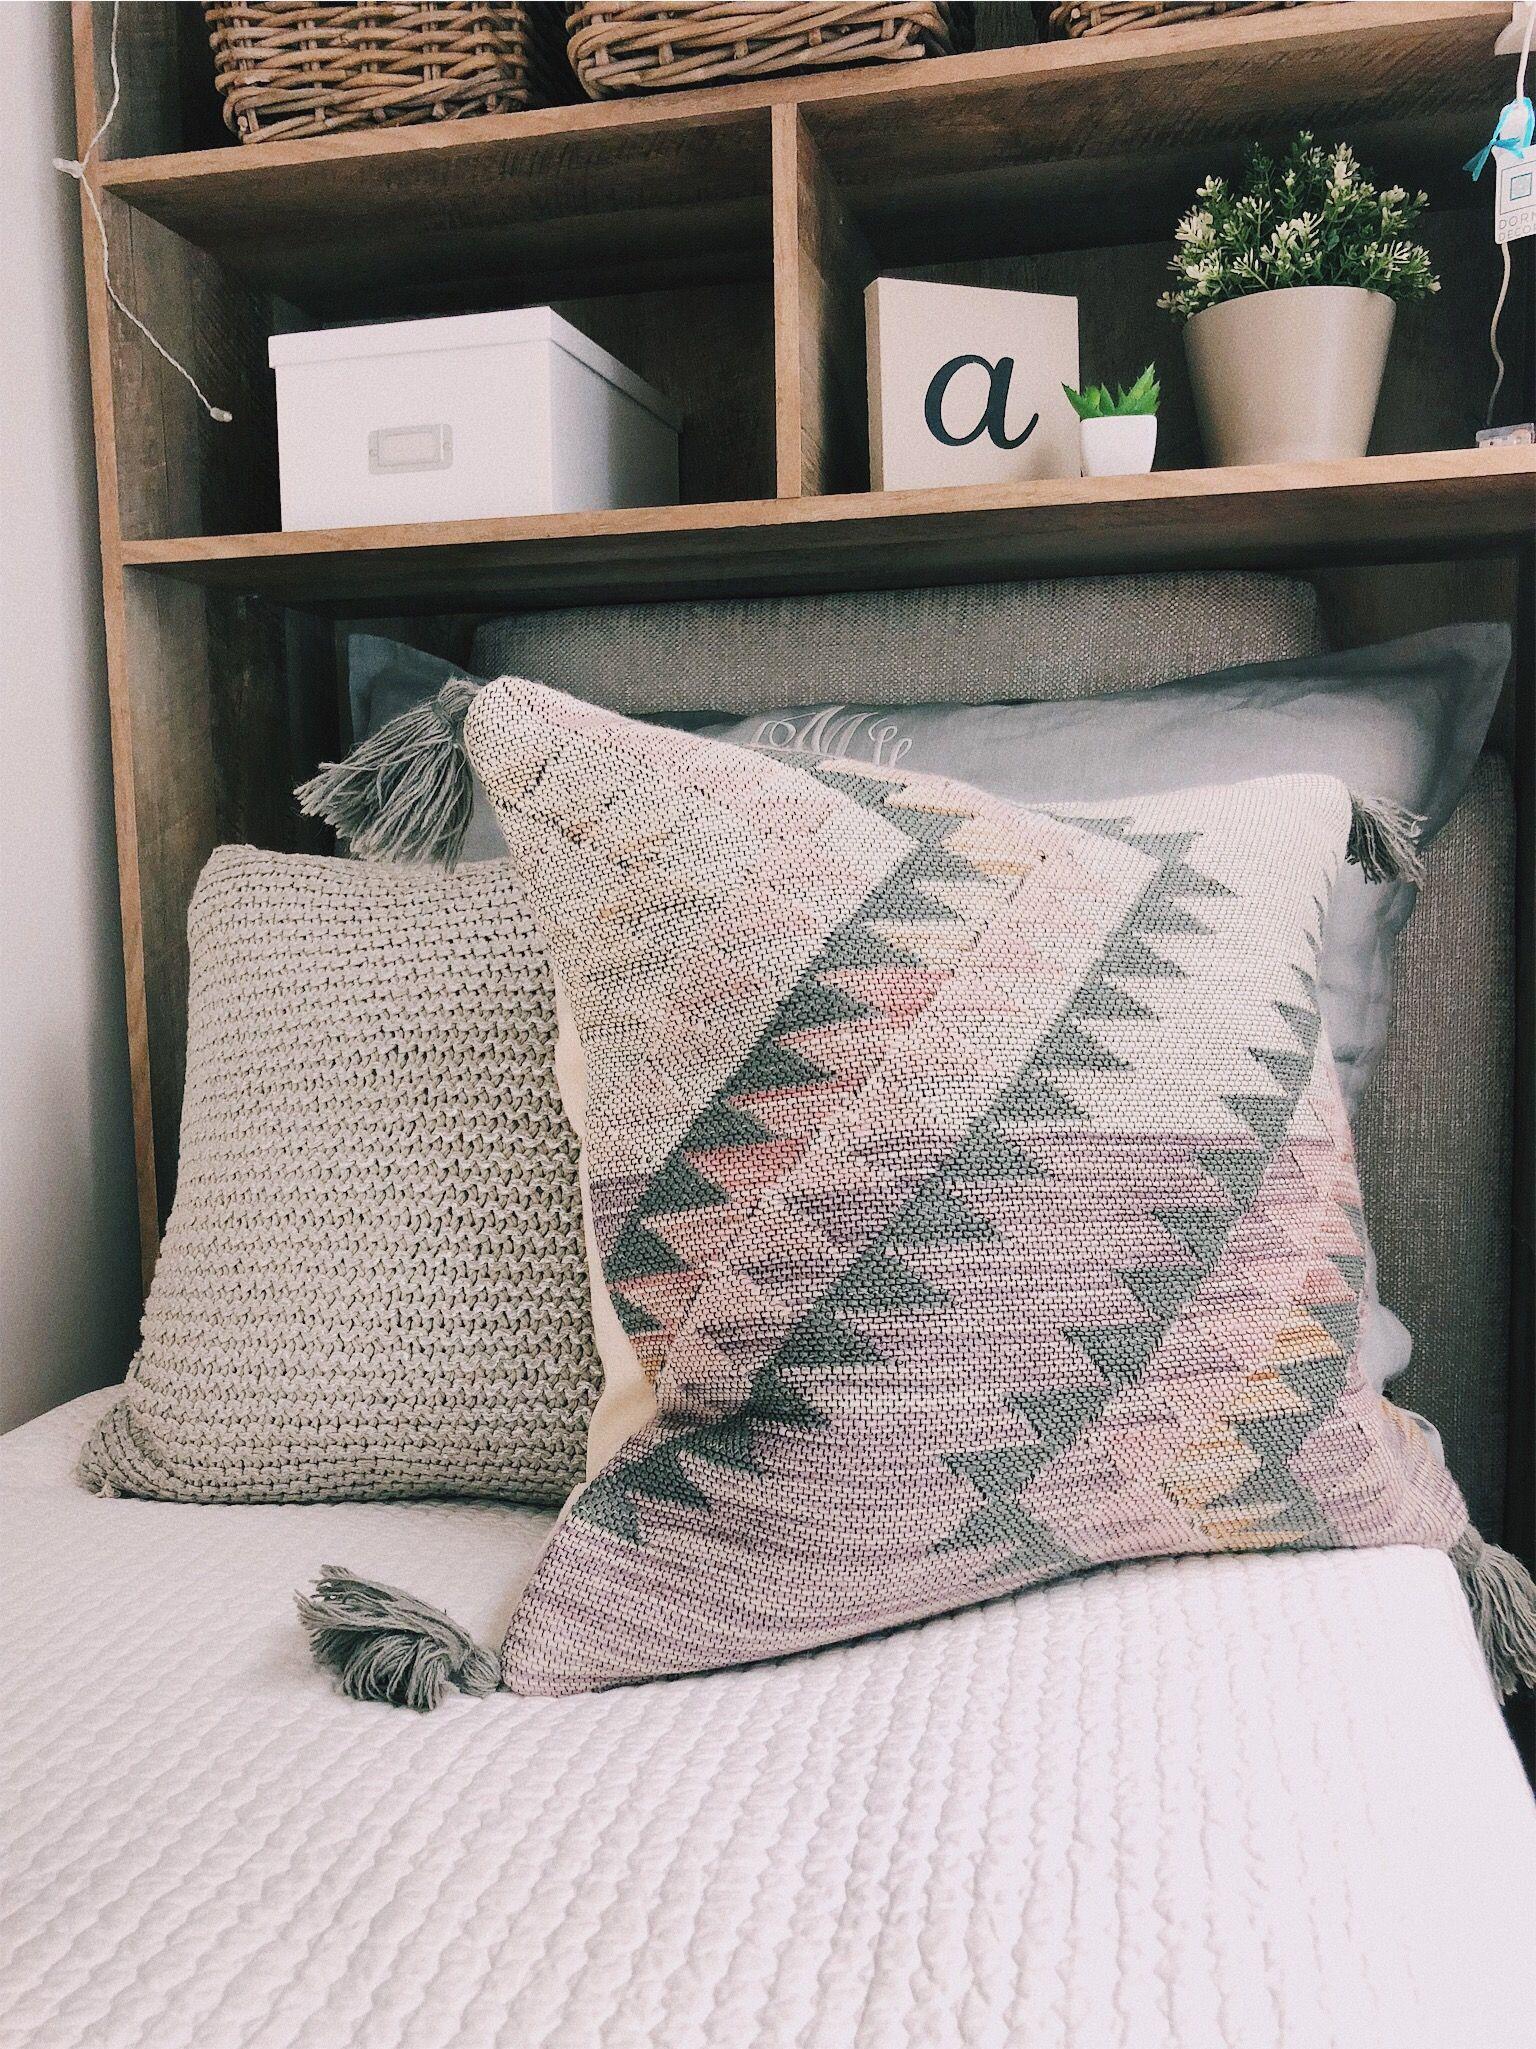 Pin By Dorm Decor On Dorm Bedding - Pinterest -